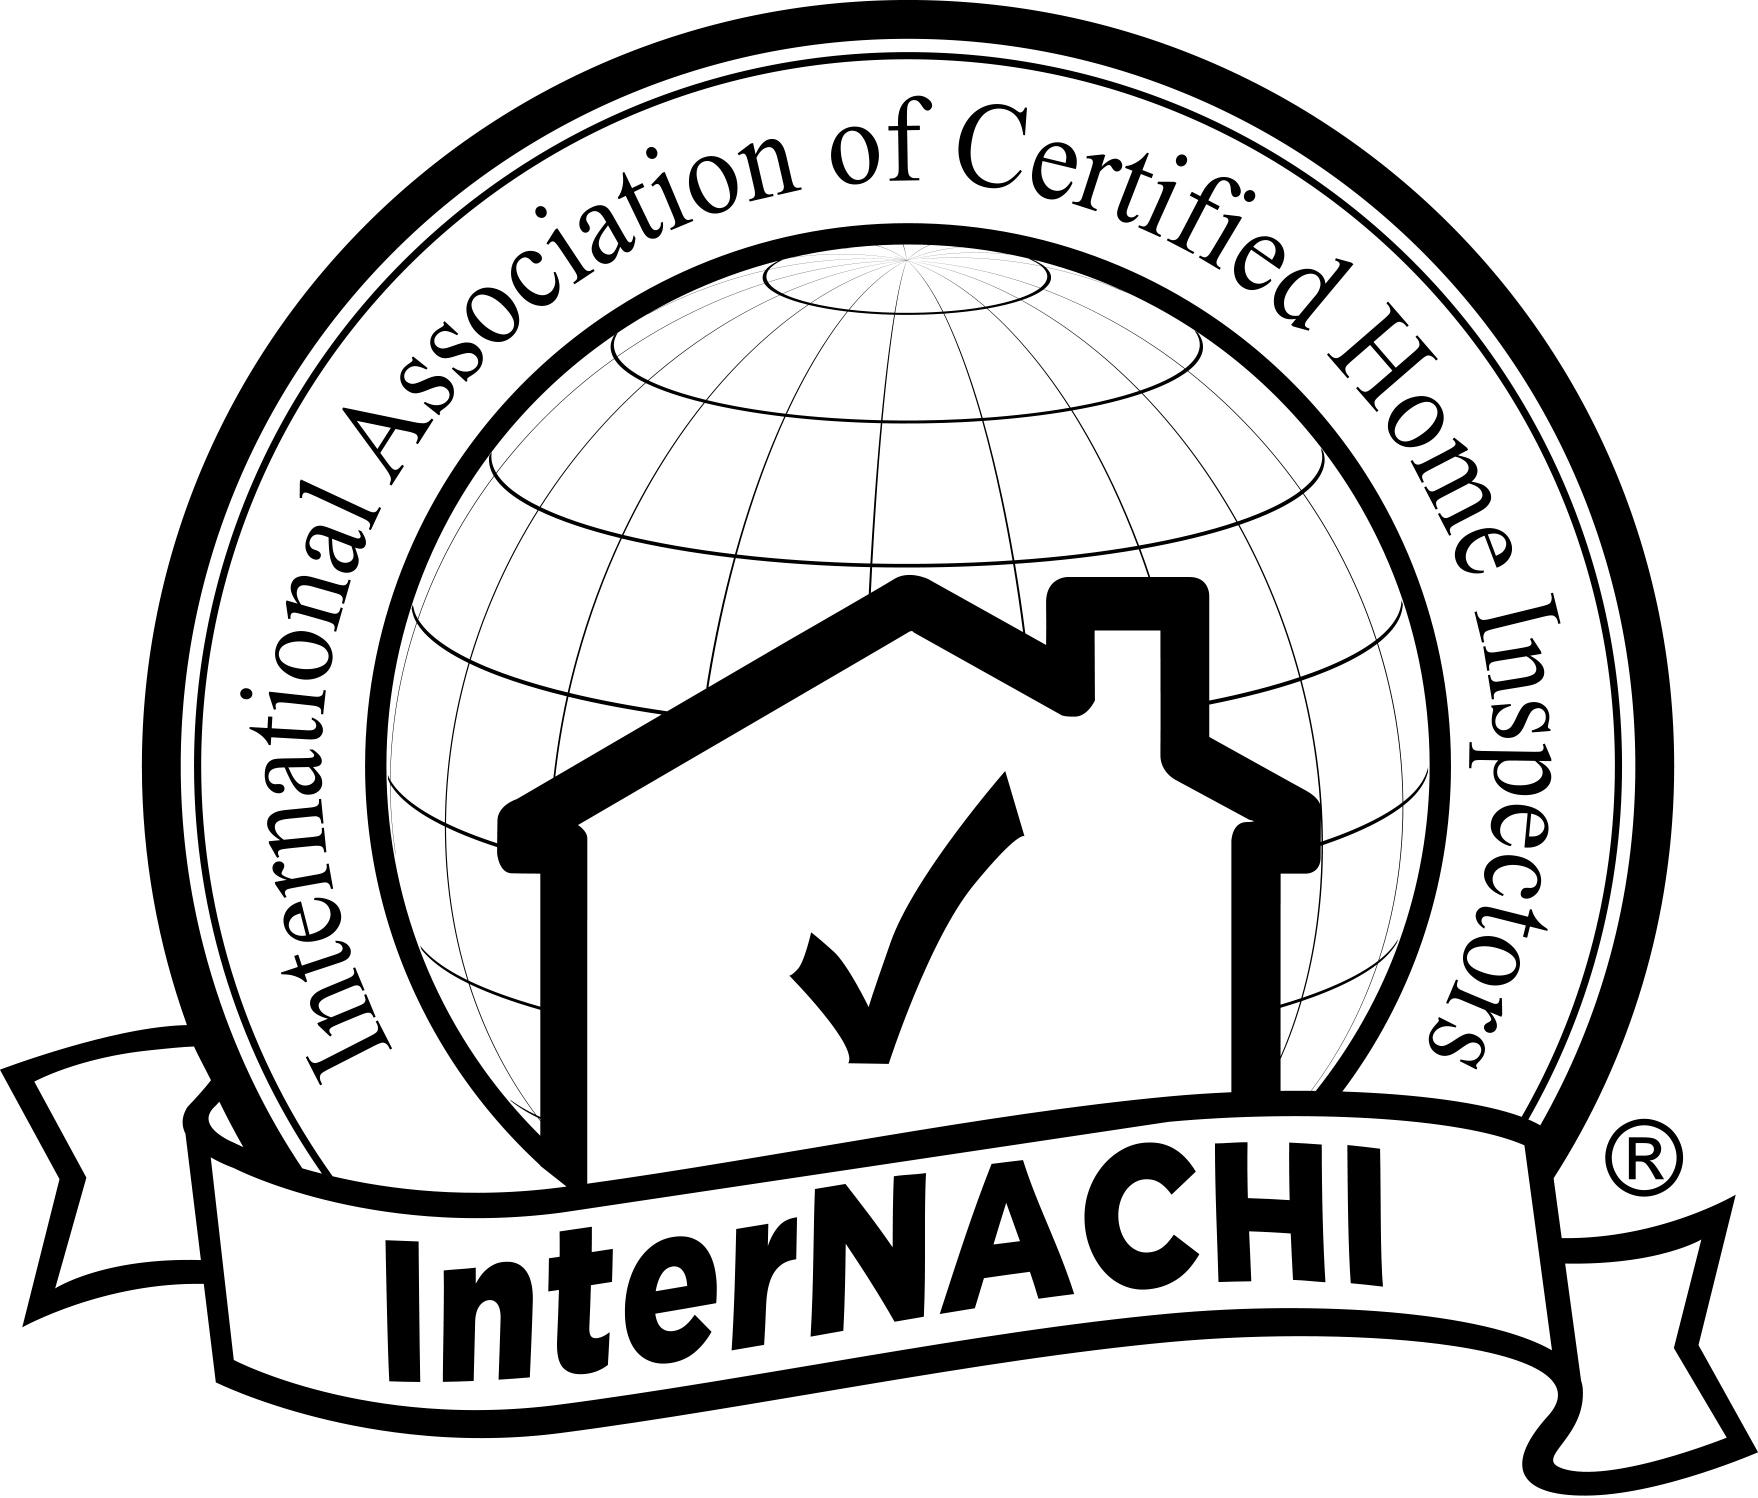 http://www.nachi.org/documents/logos/internachi/internachi.jpg